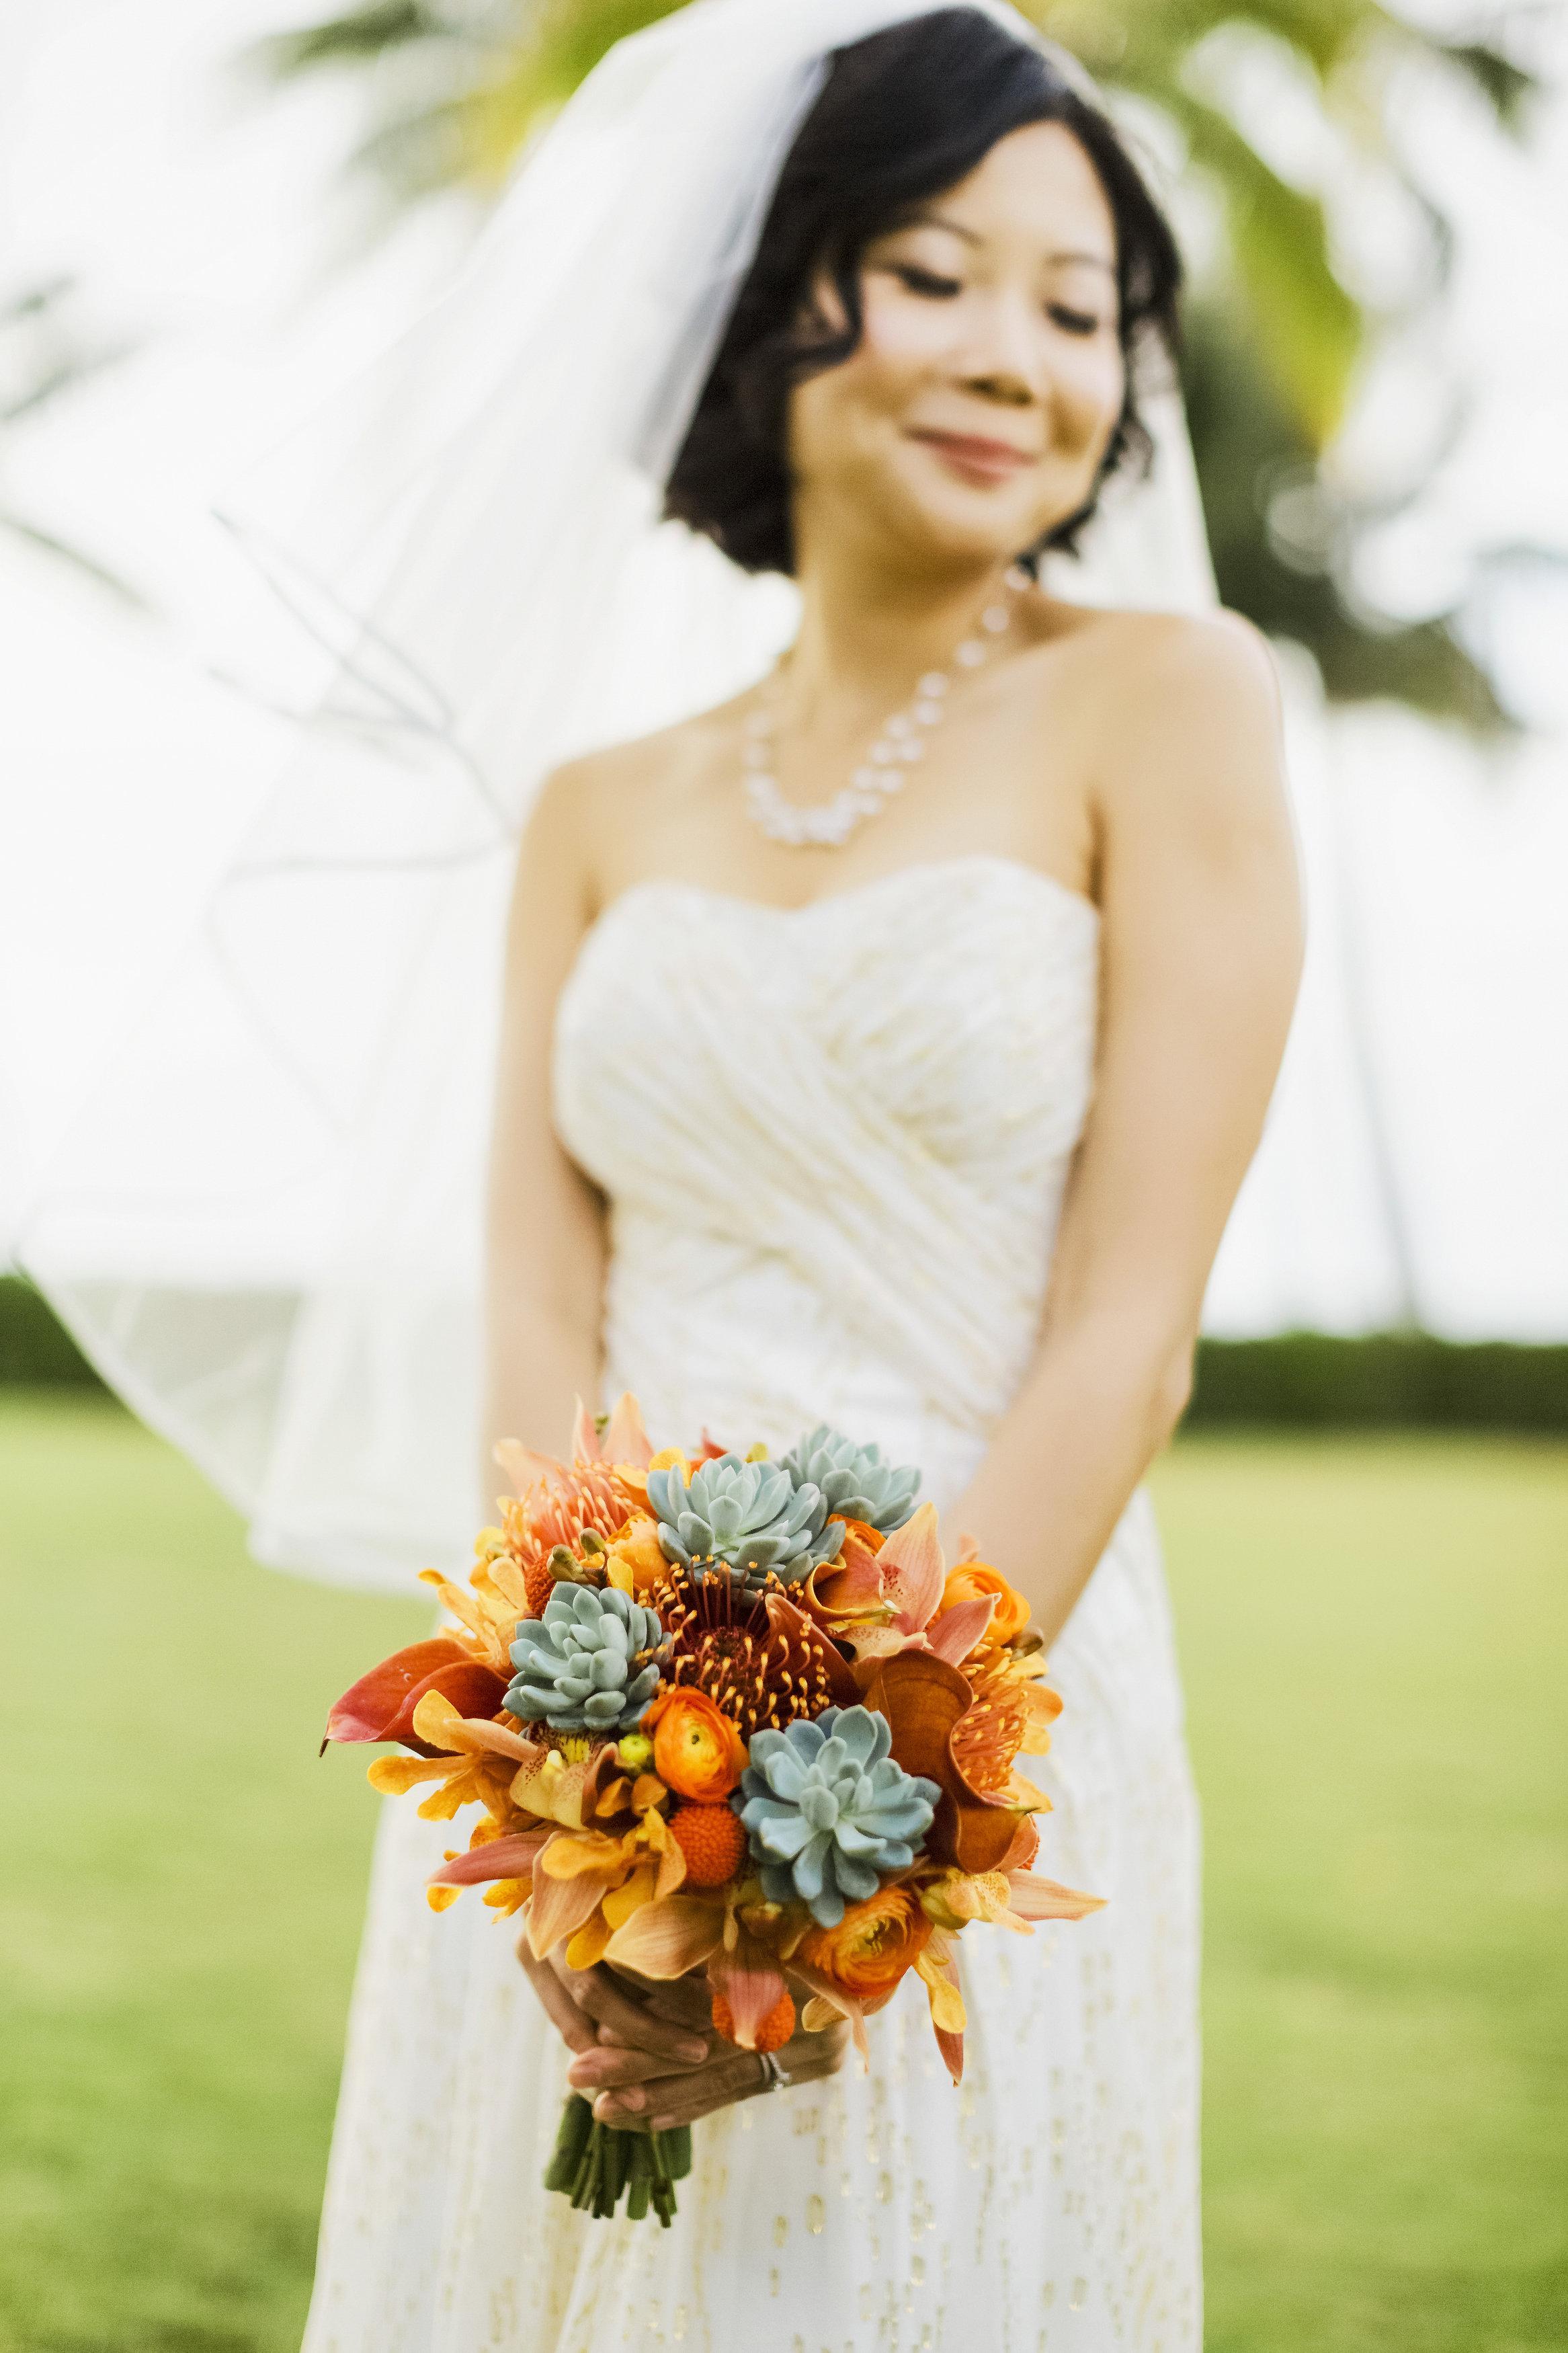 angie-diaz-photography-oahu-wedding-lanikuhonoa-shenshen-marshall-53.jpg